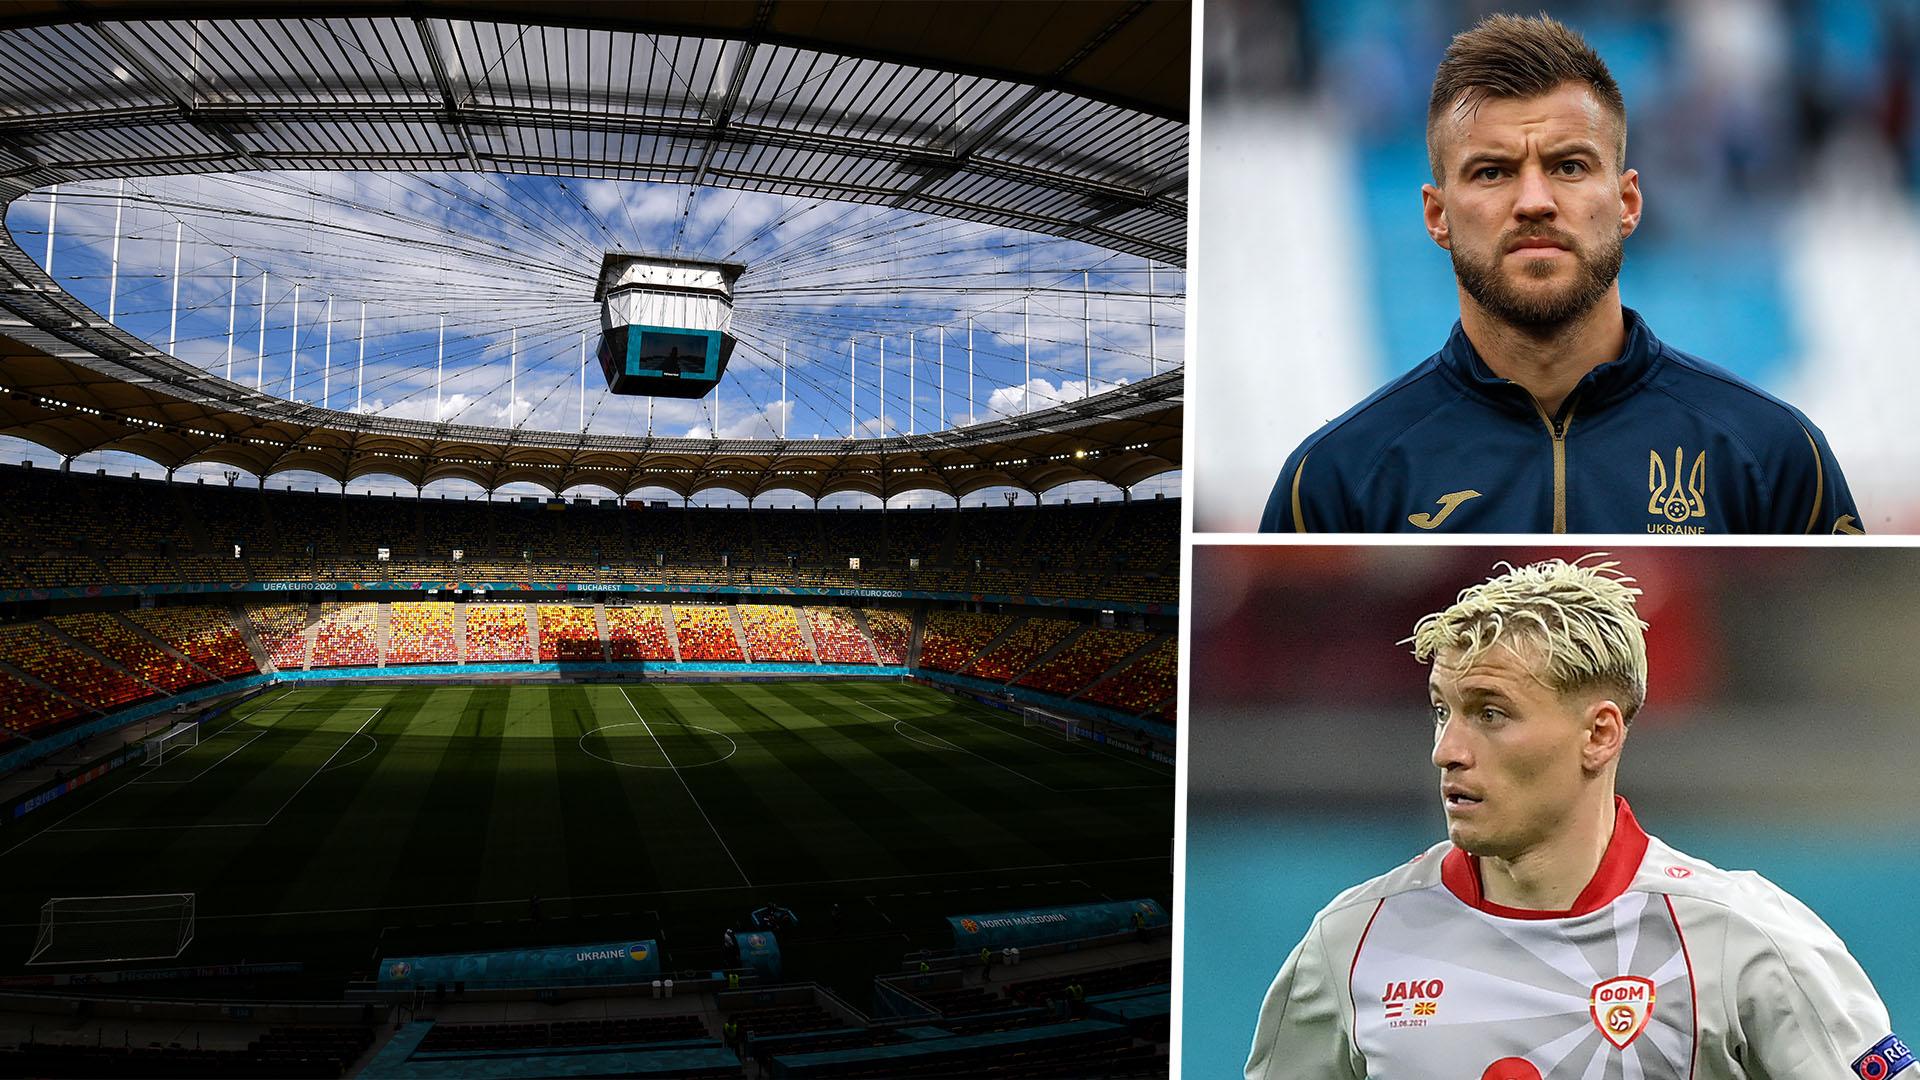 Euro 2020 matchday LIVE: Ukraine vs North Macedonia, Denmark vs Belgium, Netherlands vs Austria updates, news and TV reaction